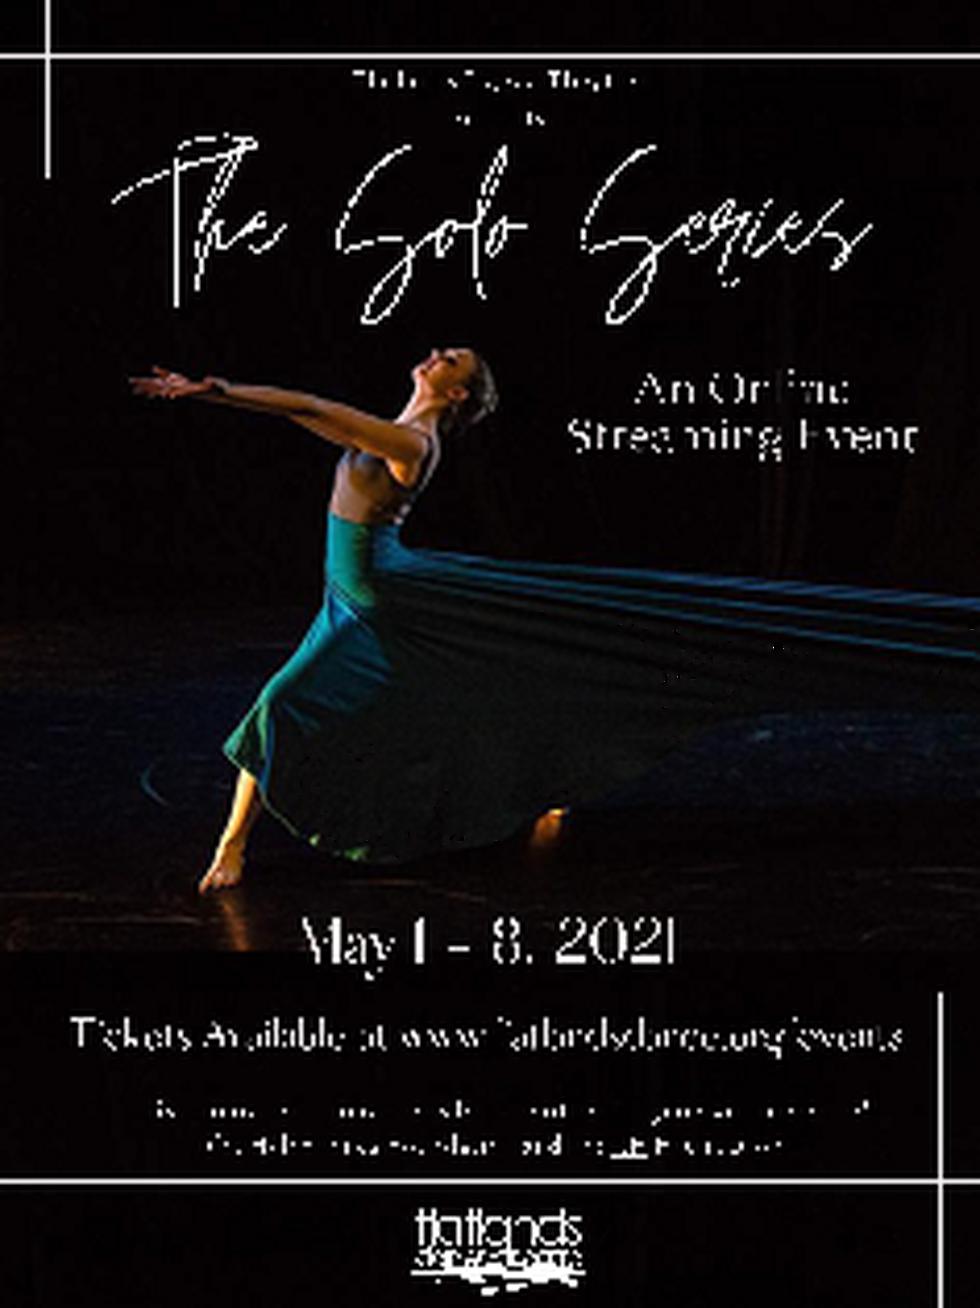 Flatlands Dance Theatre's 11th season finale, The Solo Series, invites audiences to experience...